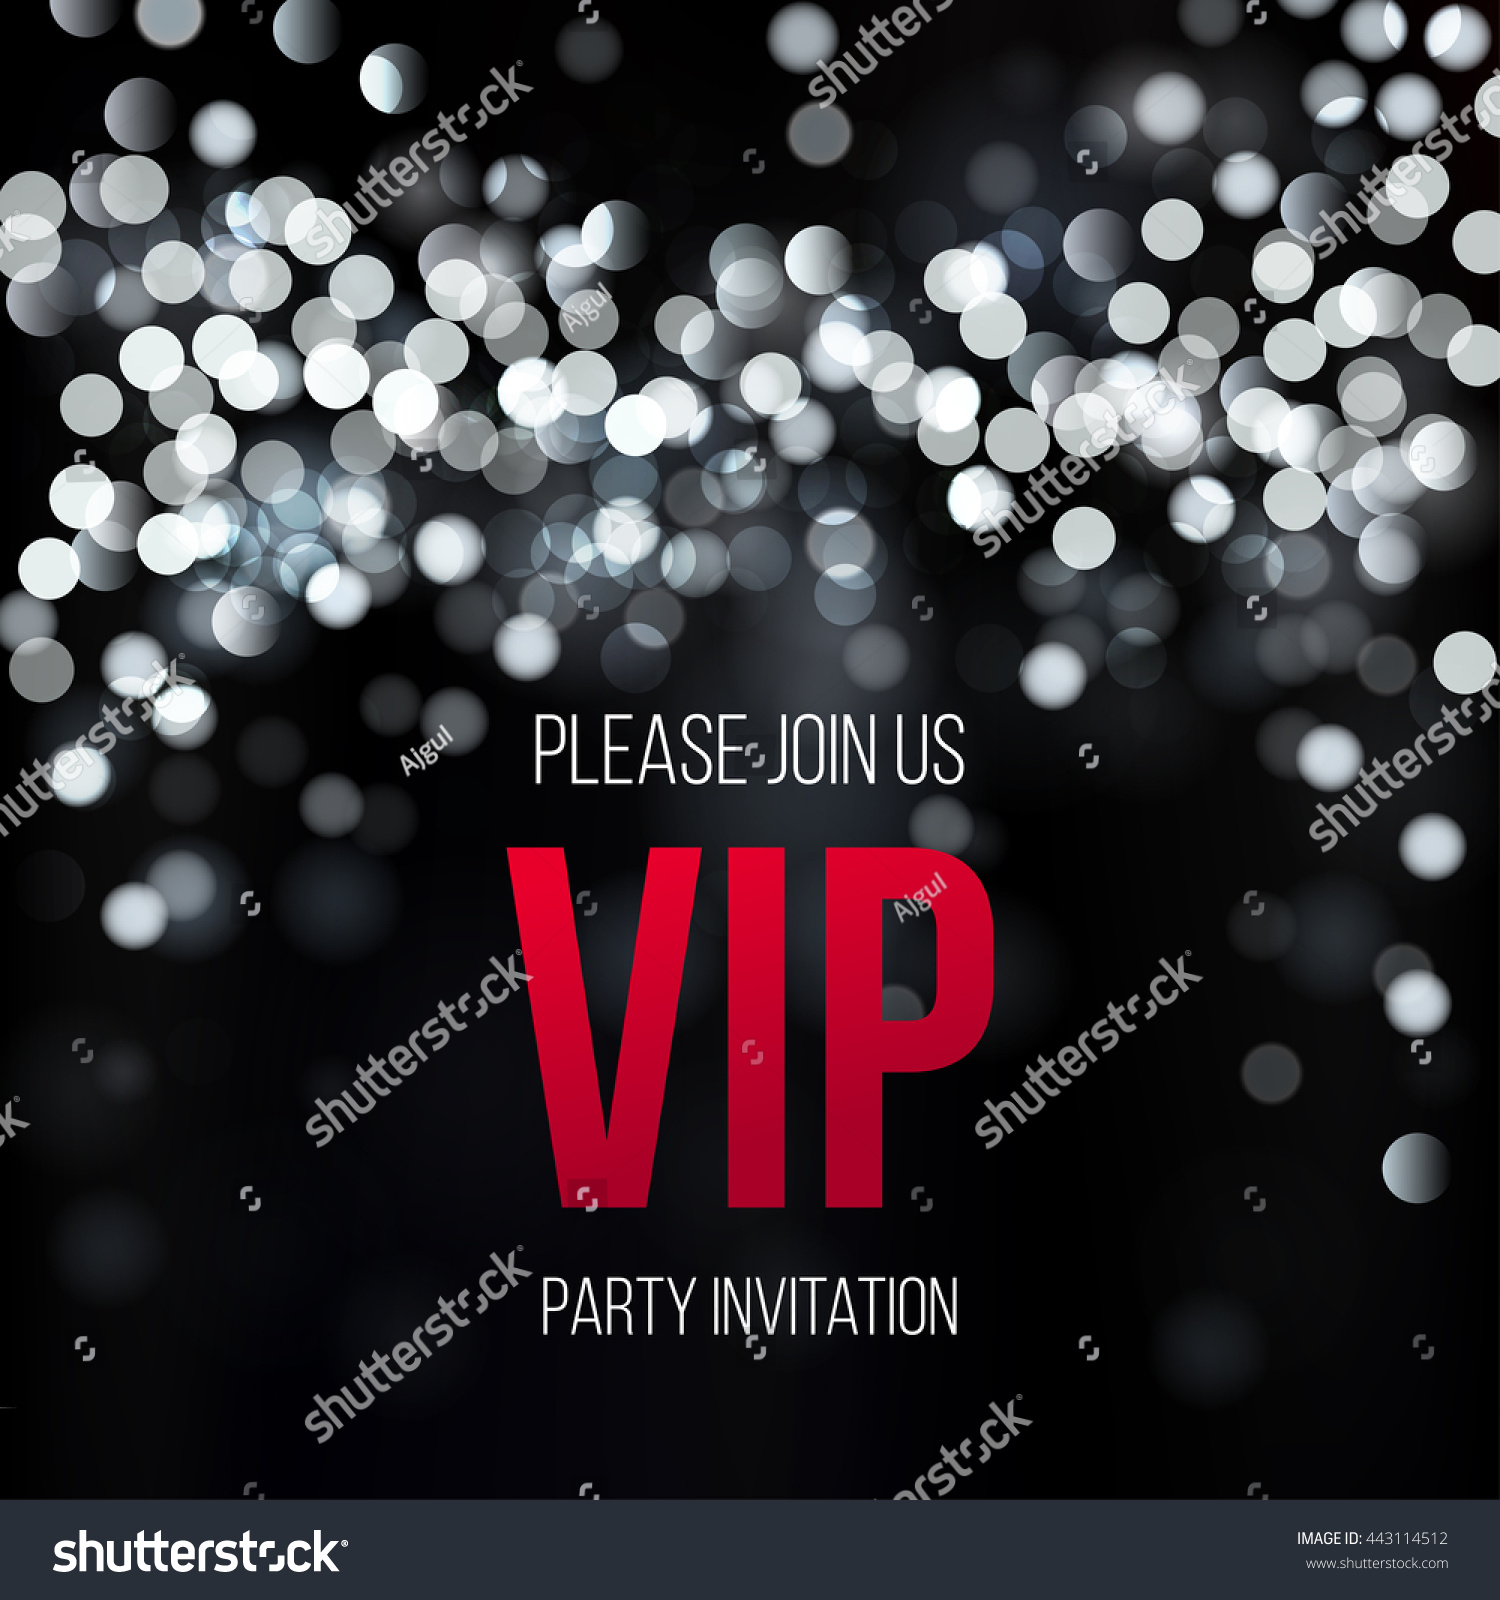 VIP Party Premium Invitation Design Template Stock Vector (Royalty ...